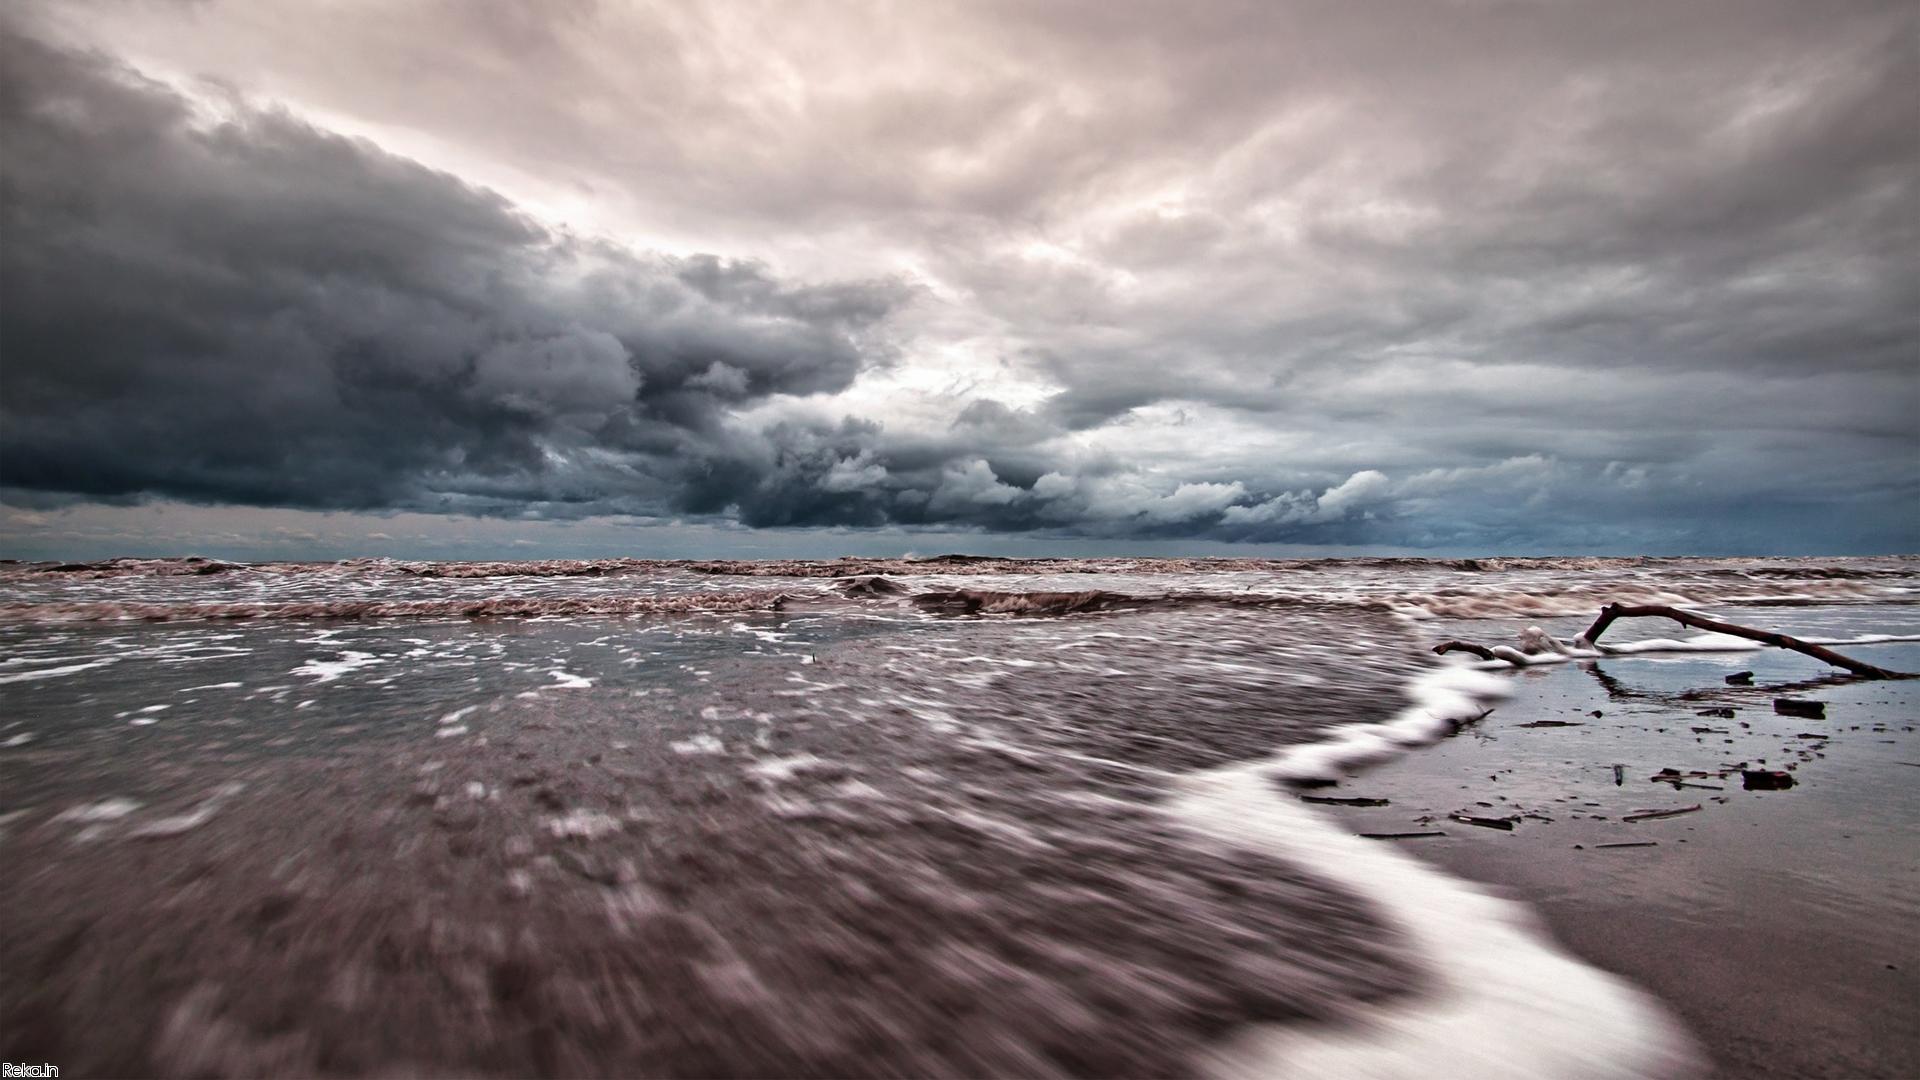 Stormy Ocean Wallpaper - 52DazheW Gallery